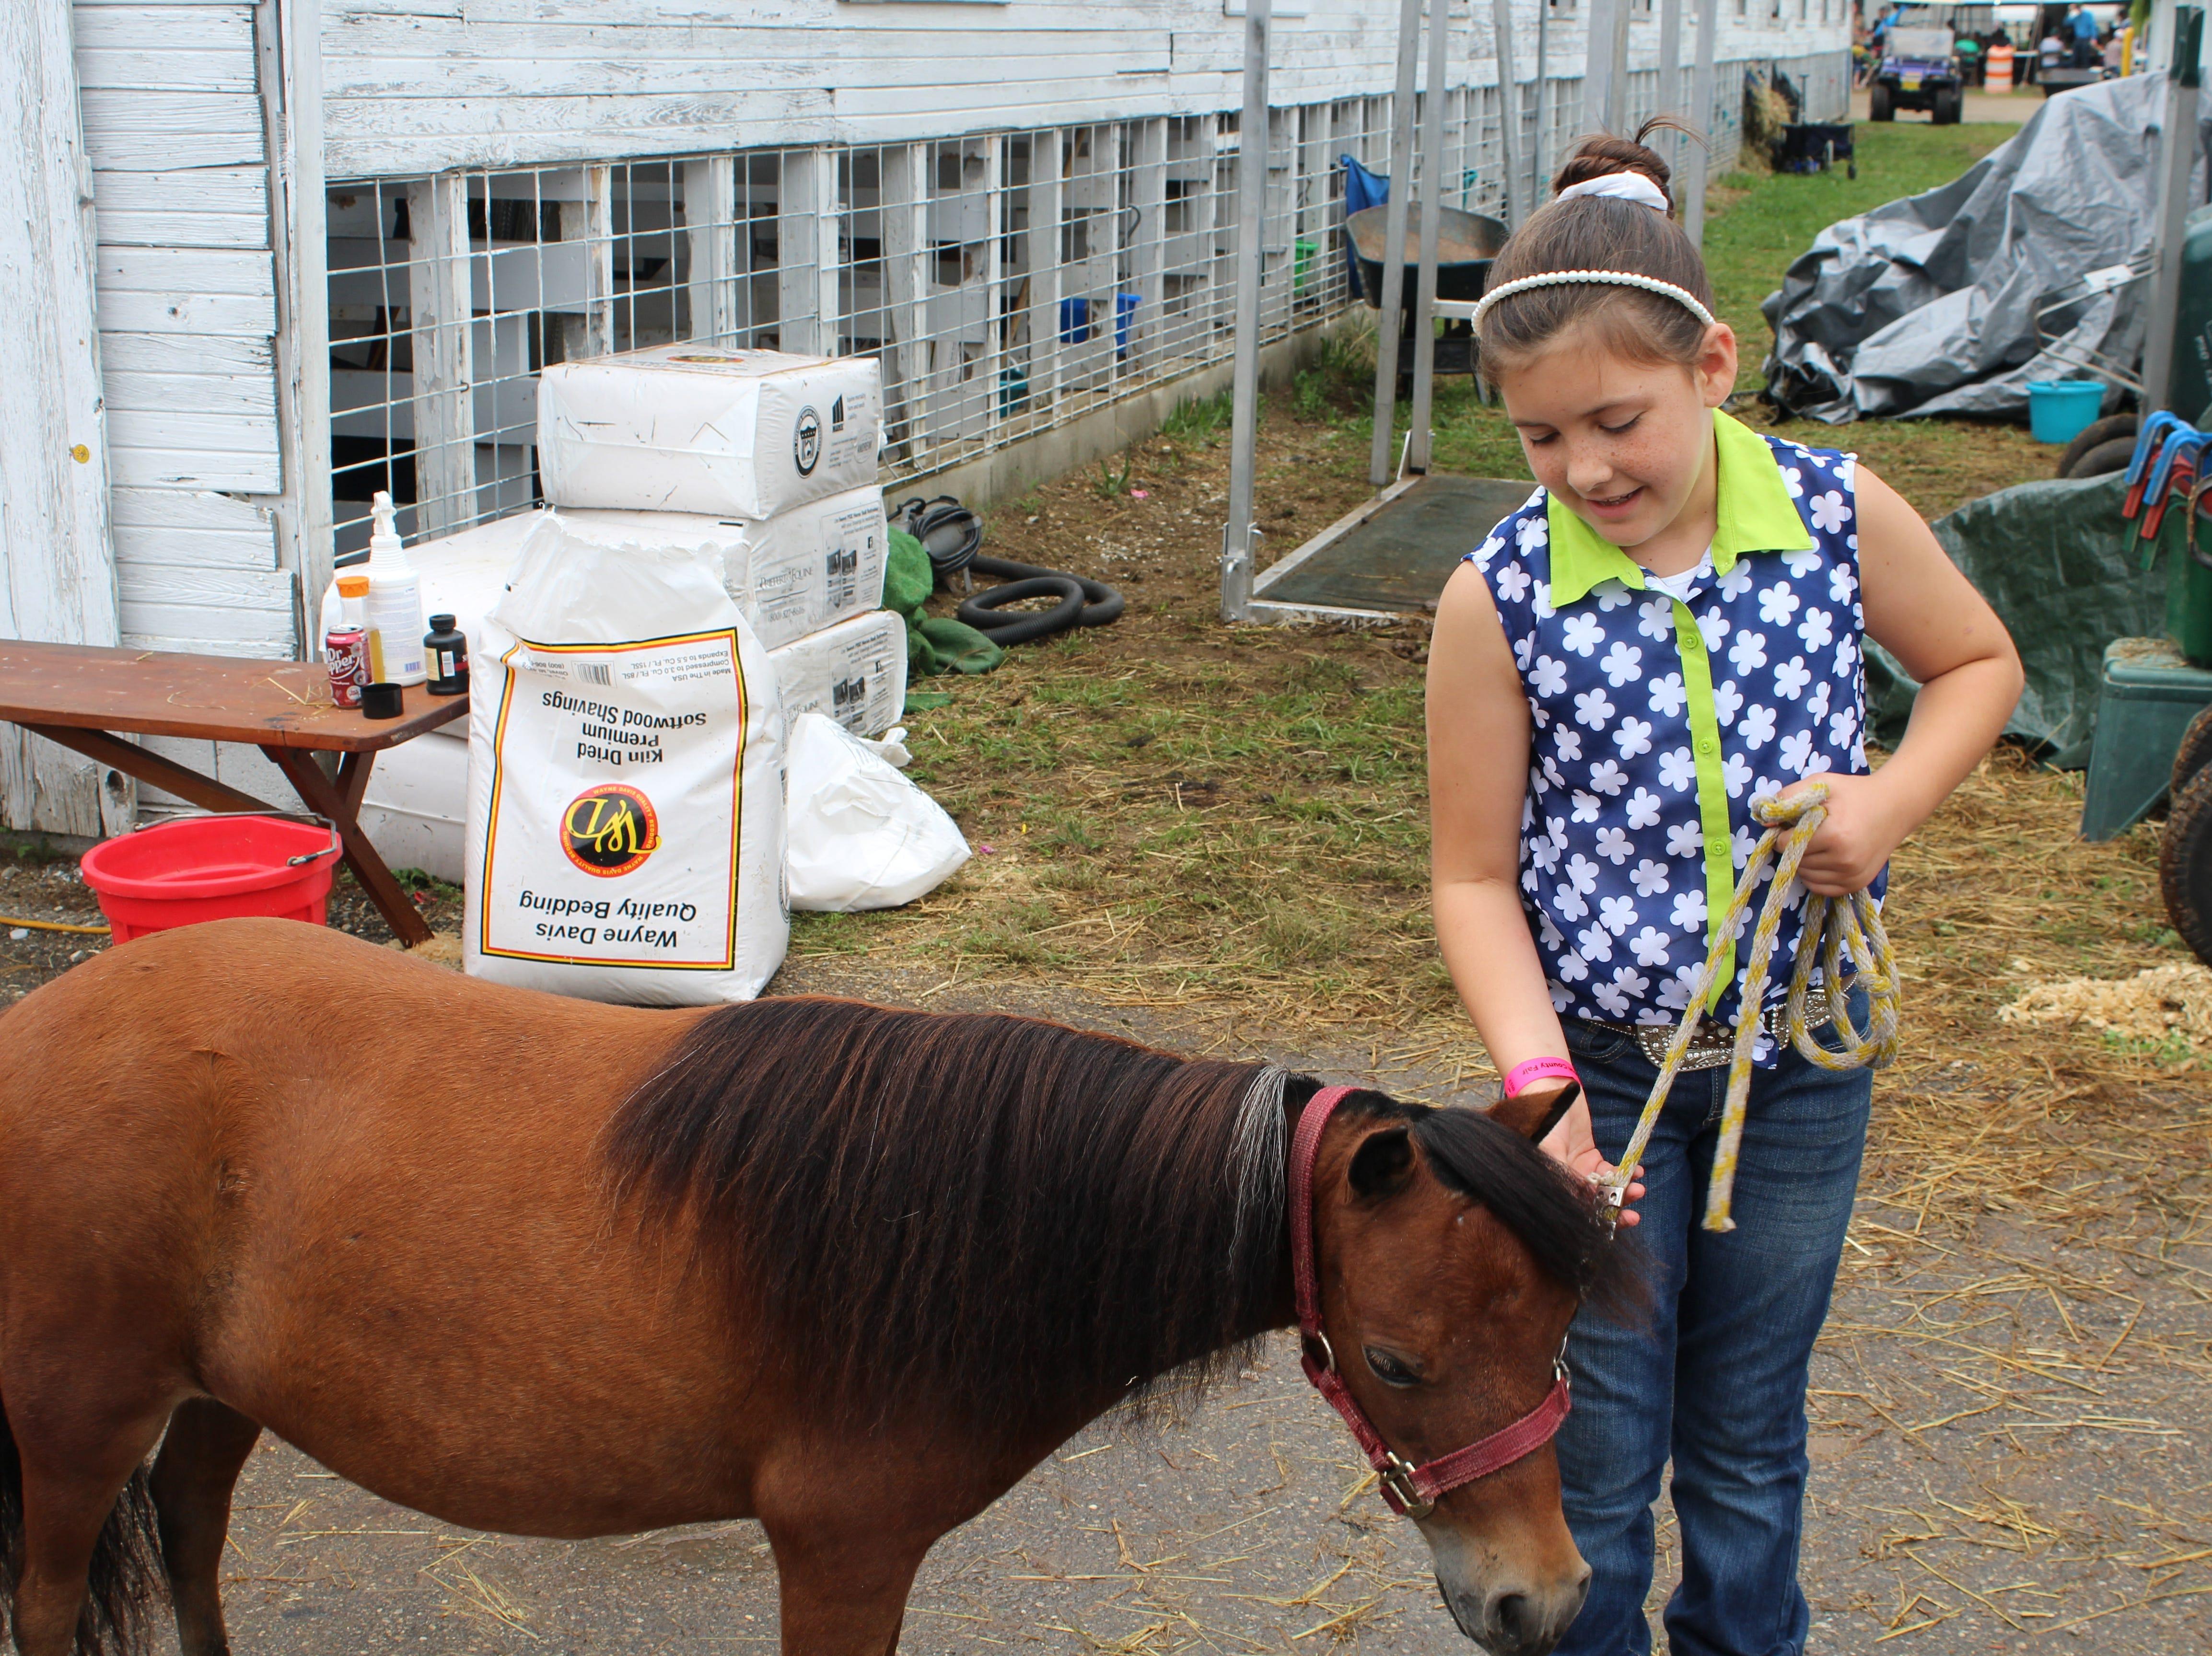 Ava Brodock, 9, shows off her miniature horse, Rhuna at the Calhoun County Fair.